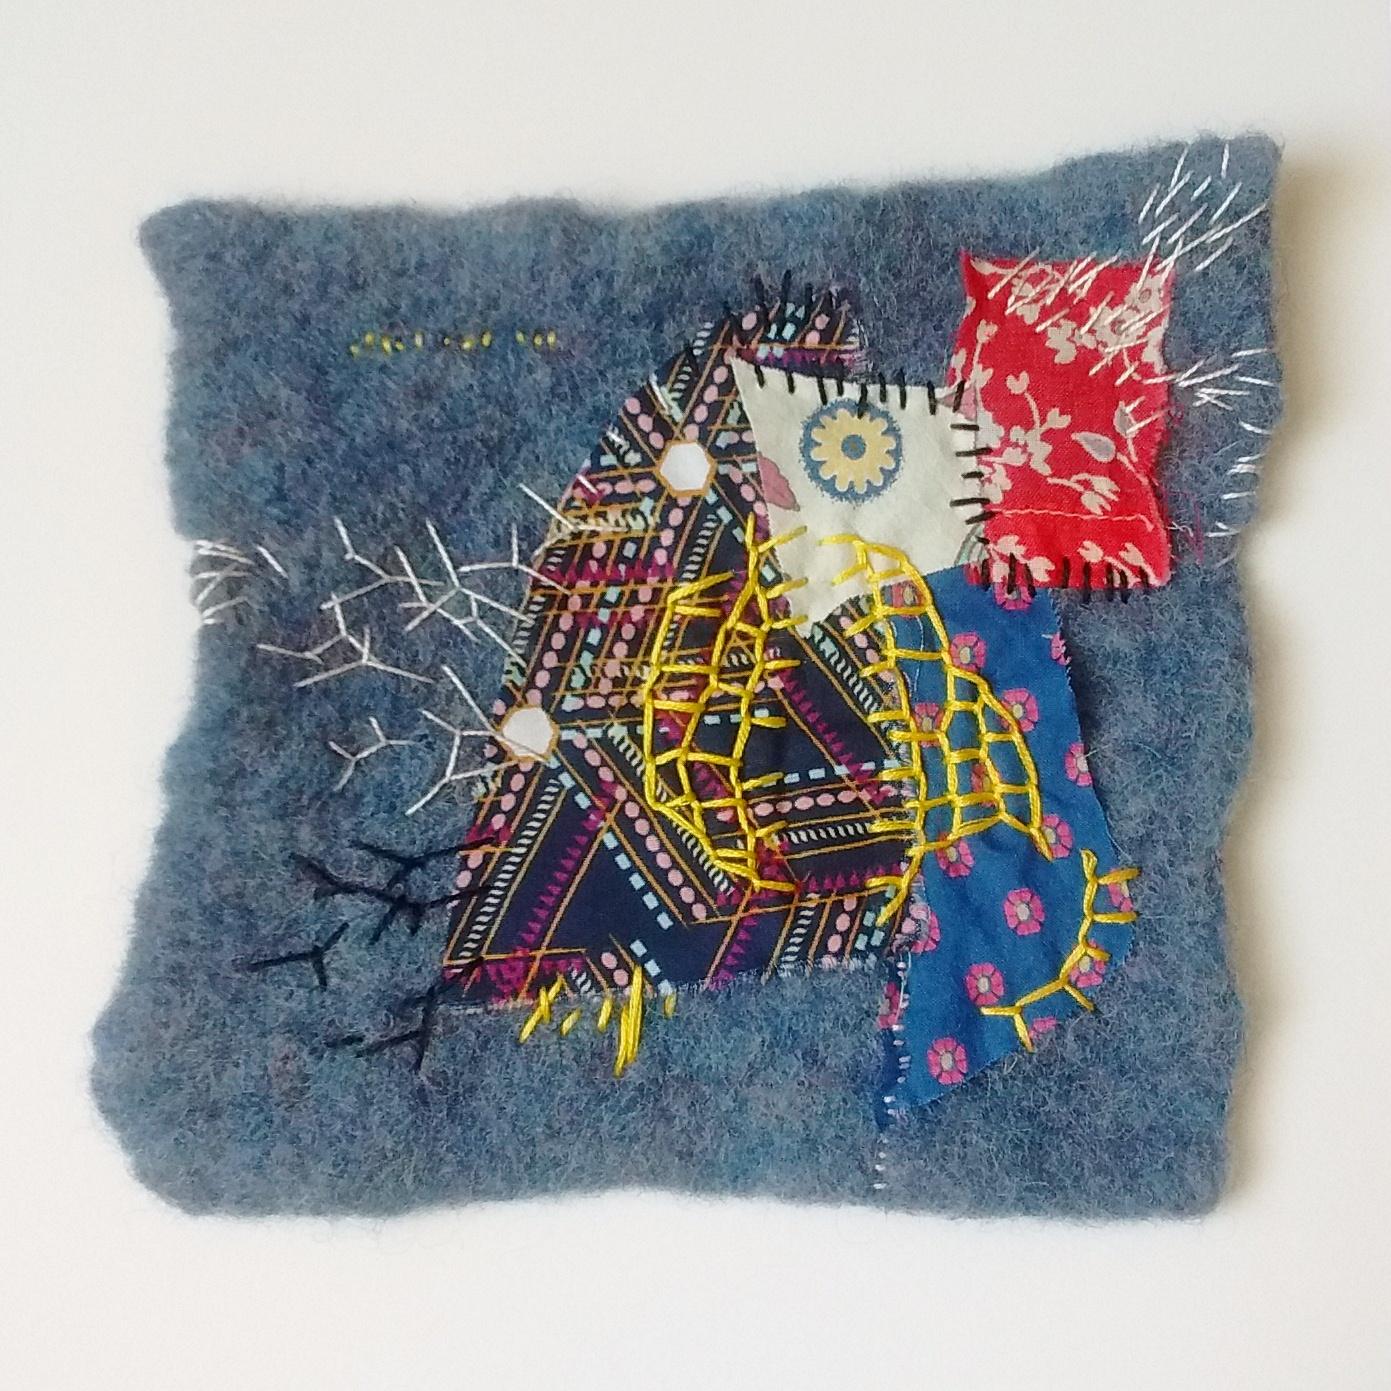 stitch9.jpg